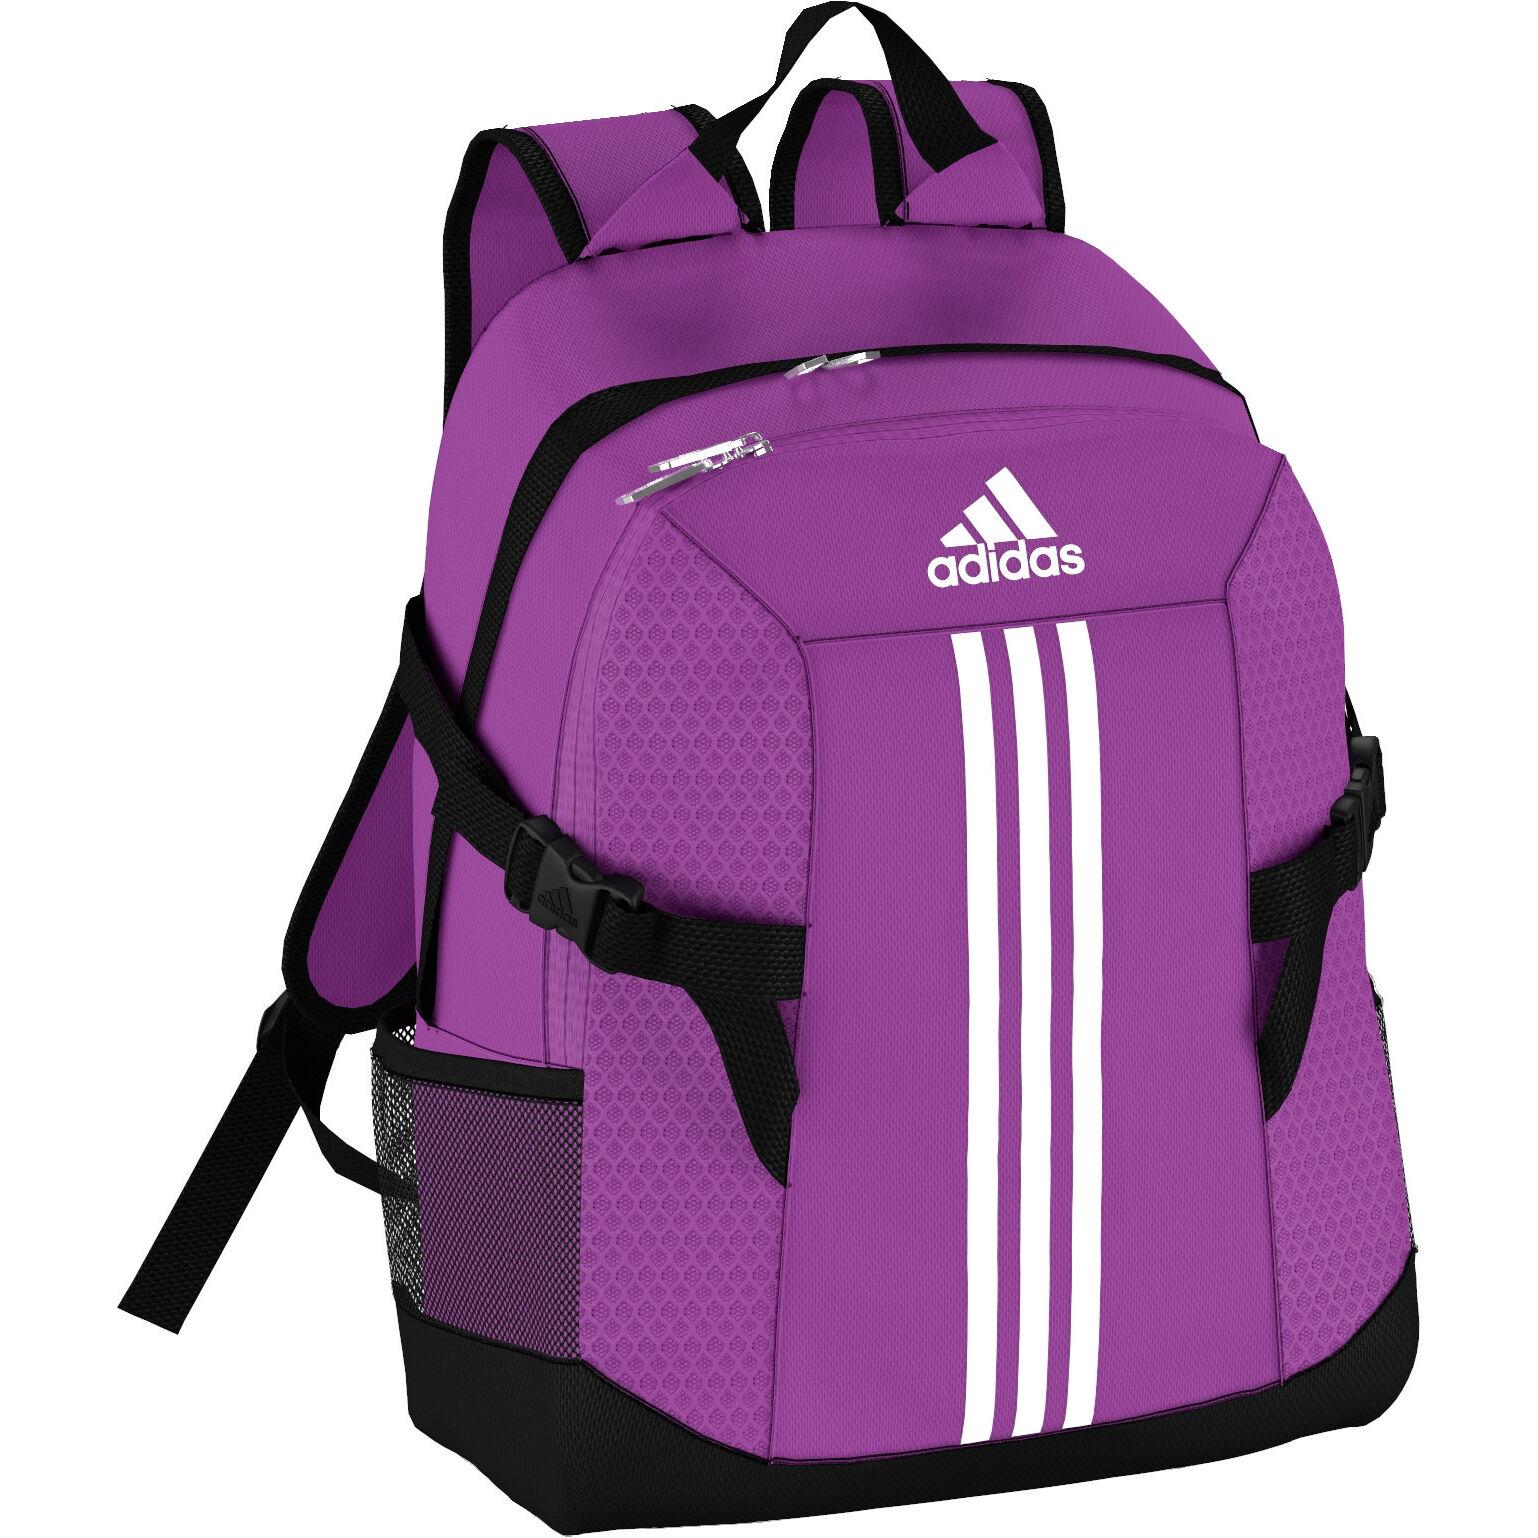 adidas Backpack Power II Rucksack günstig kaufen   eBay